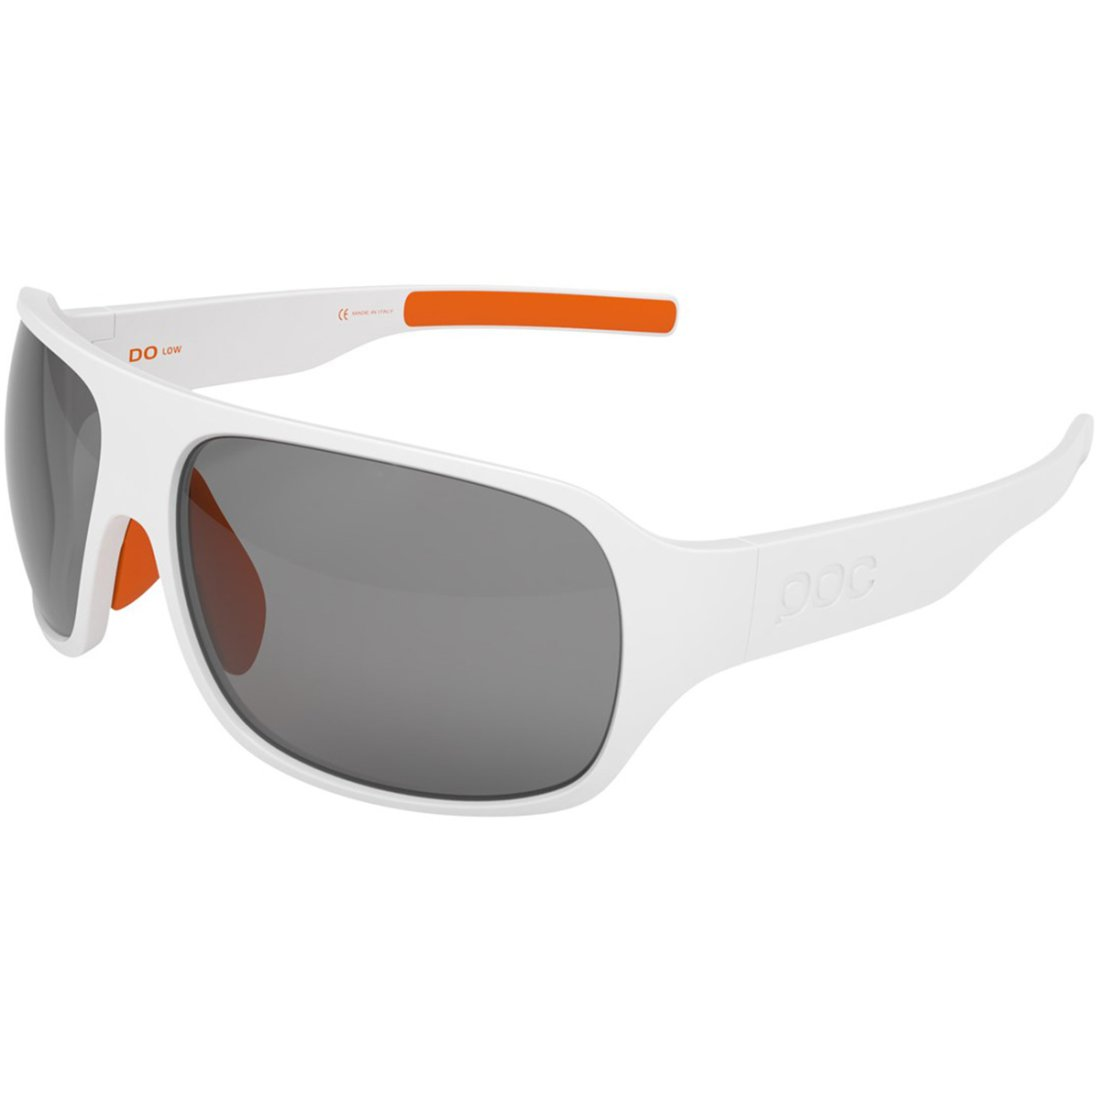 72cf7fcc51 POC DO Low Hydrogen White Mask   Goggle · Motocard